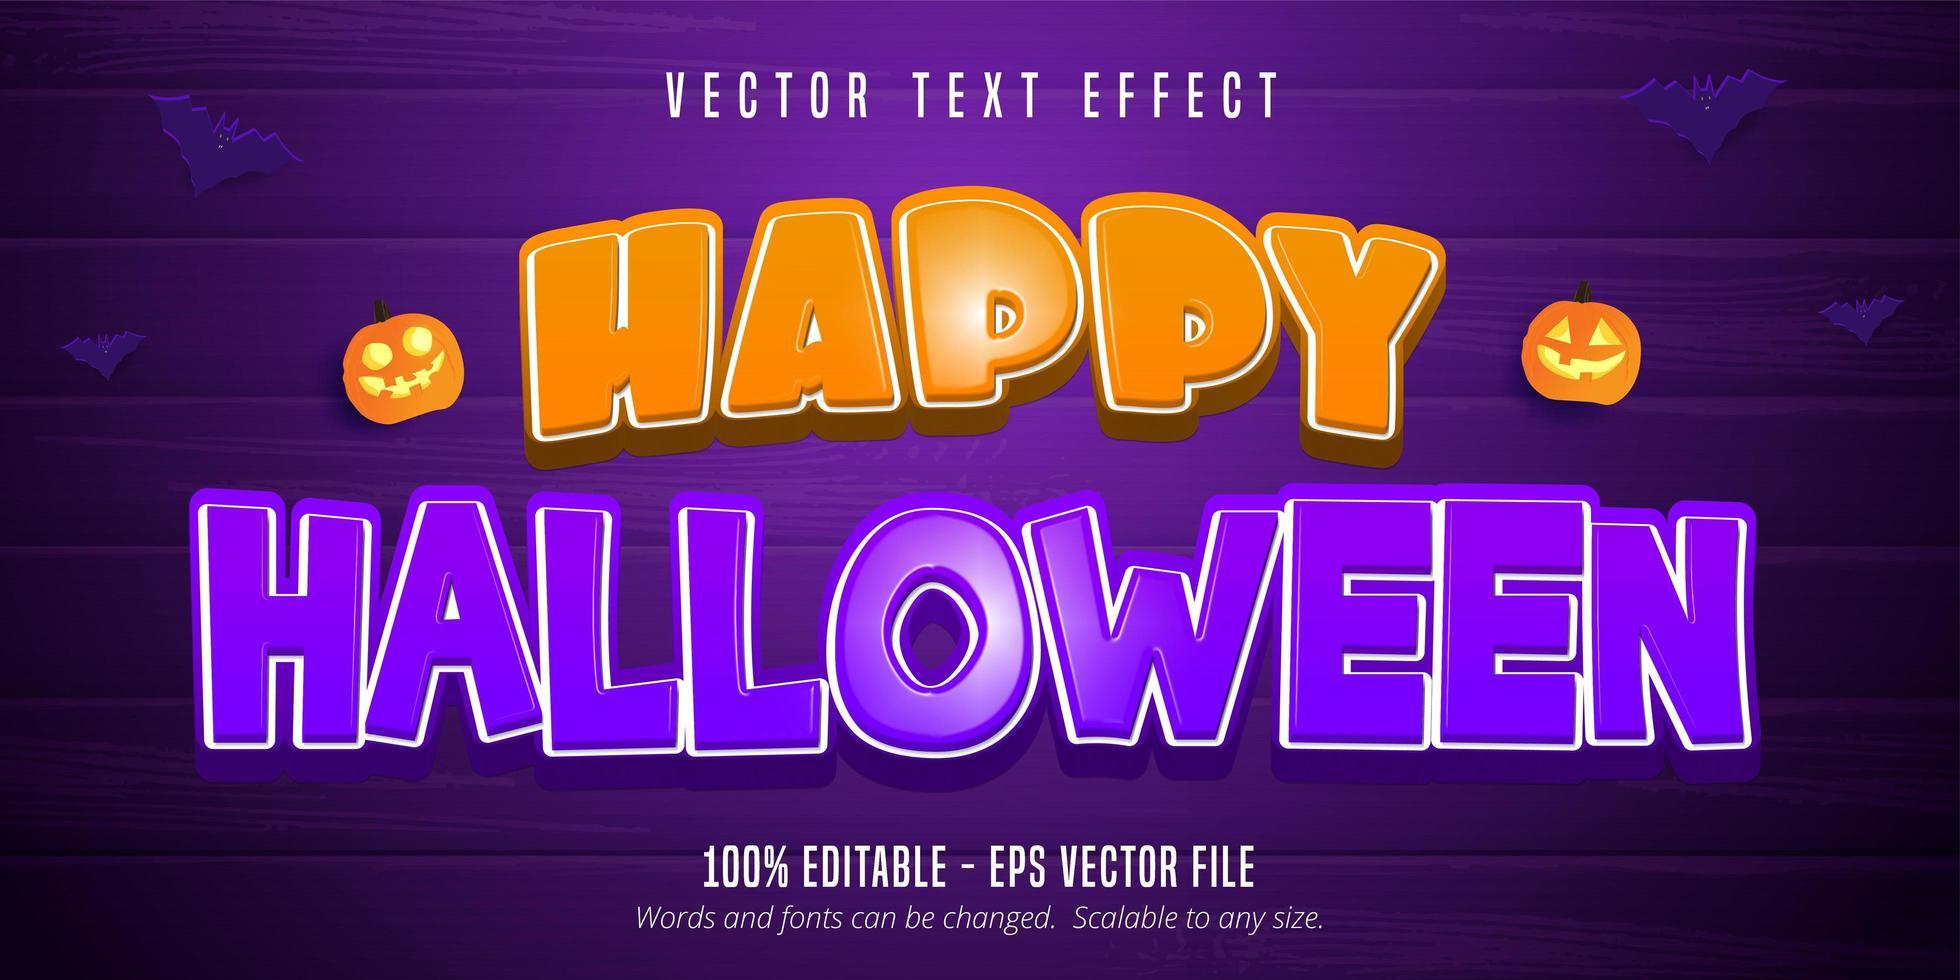 glad halloween text vektor